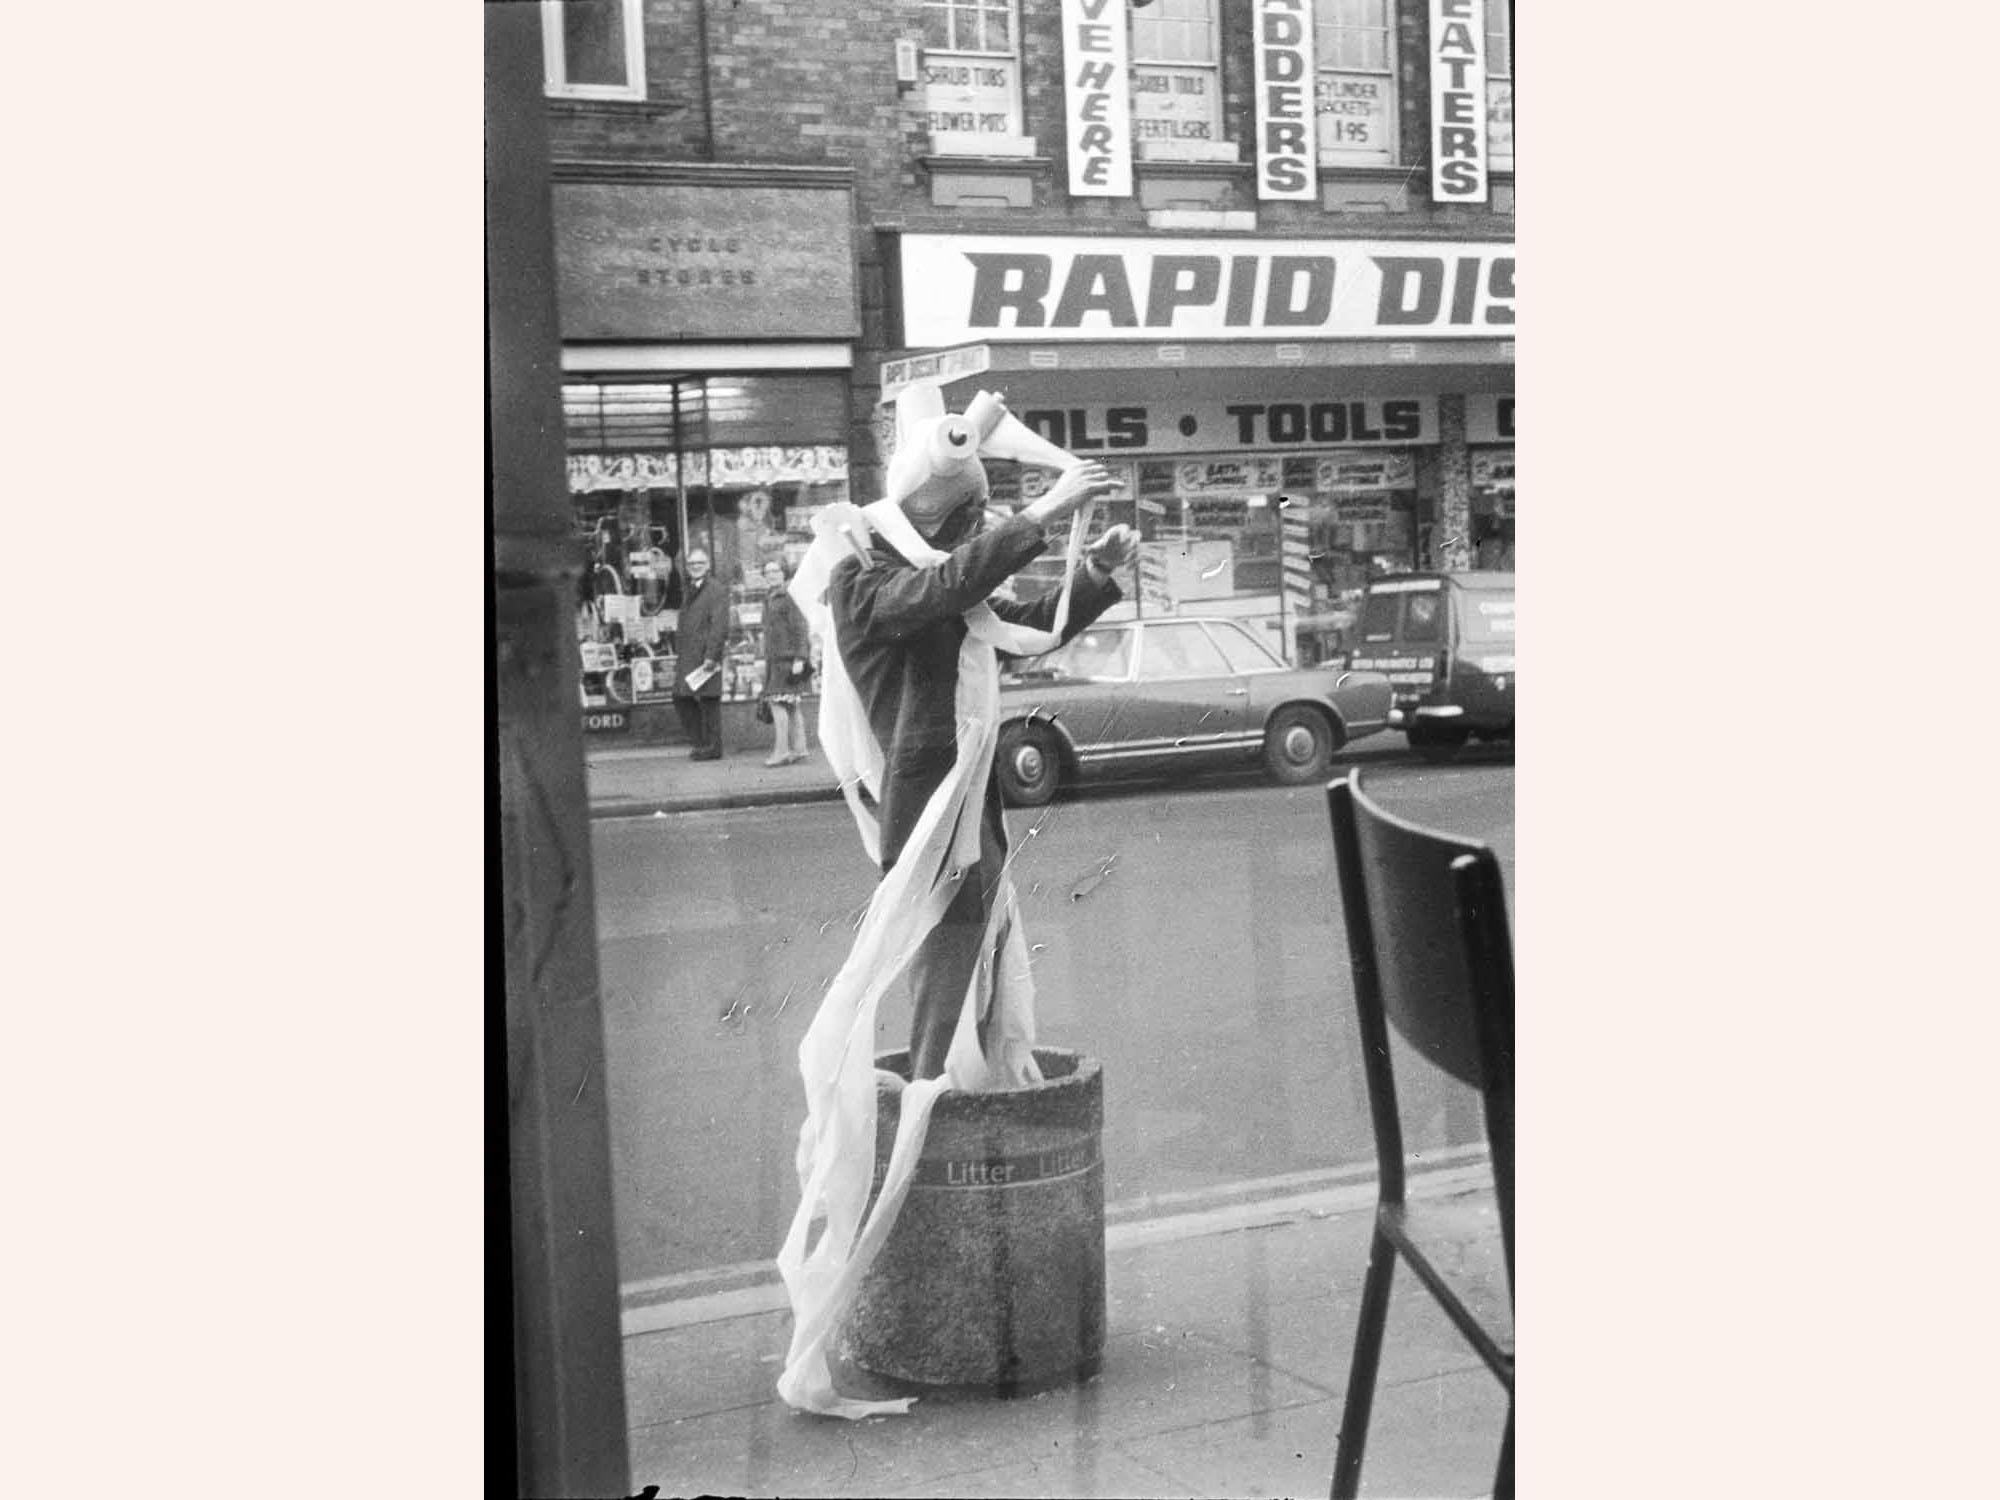 Marty St James, Live Social Sculpture, (1976).